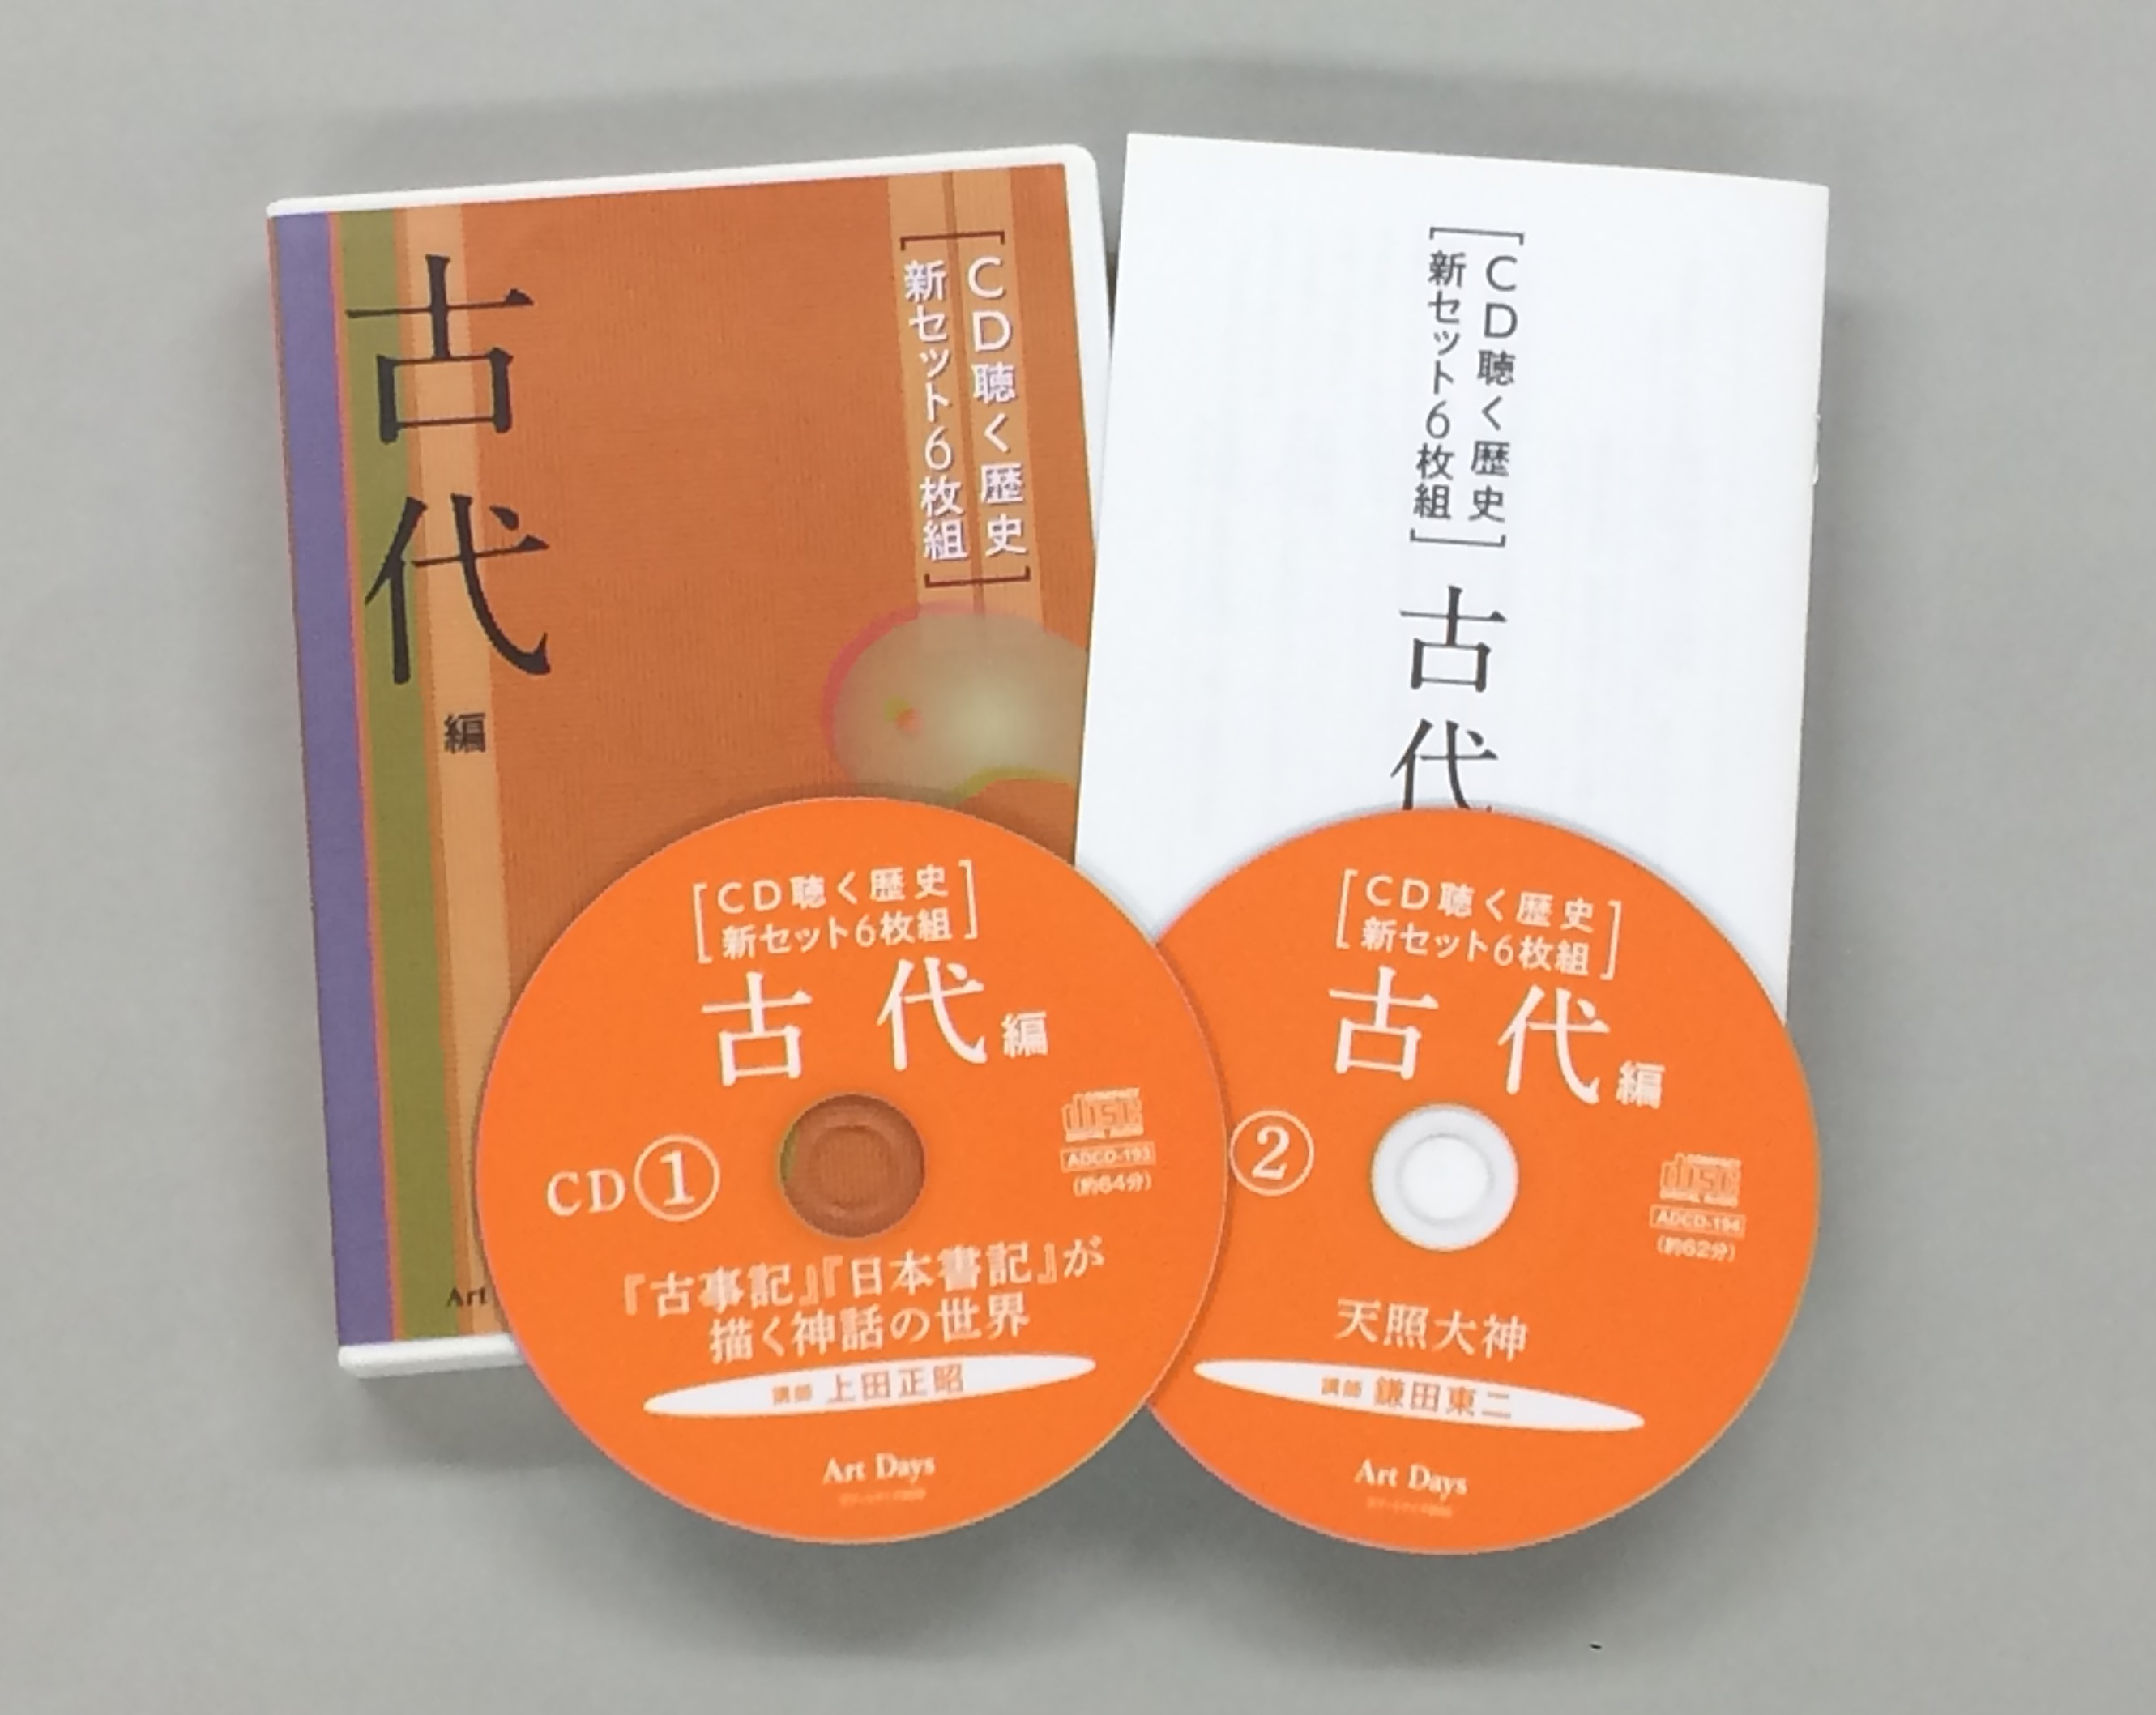 CD聴く歴史 新セット6枚組 古代編